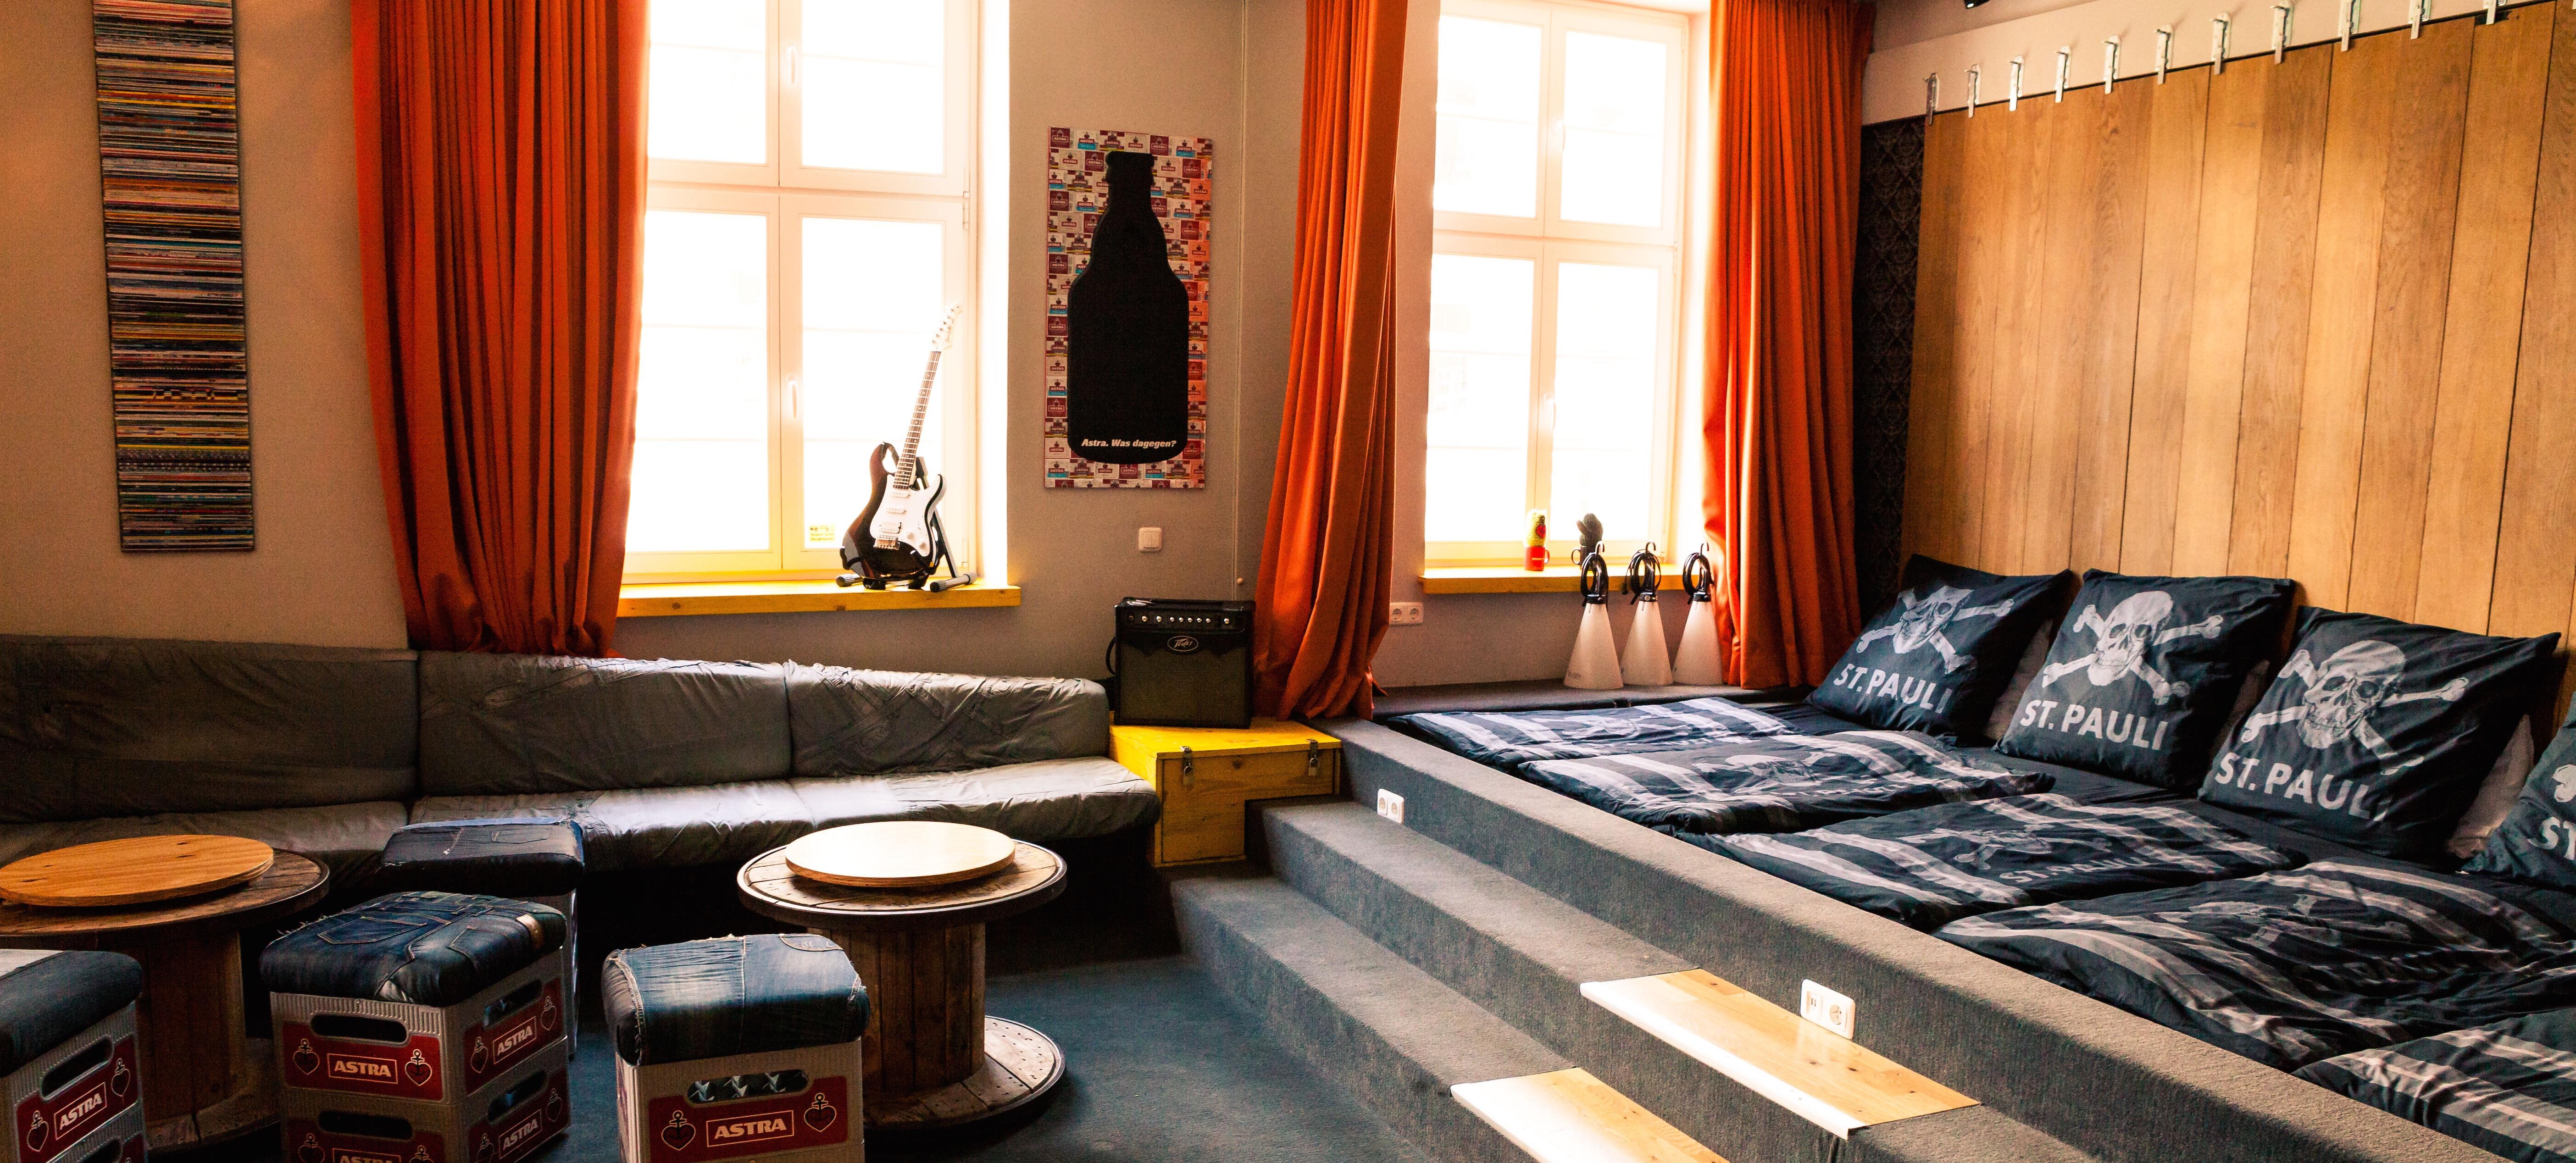 Location-Hamburg-Superbude-01 - Heyminga Touren München